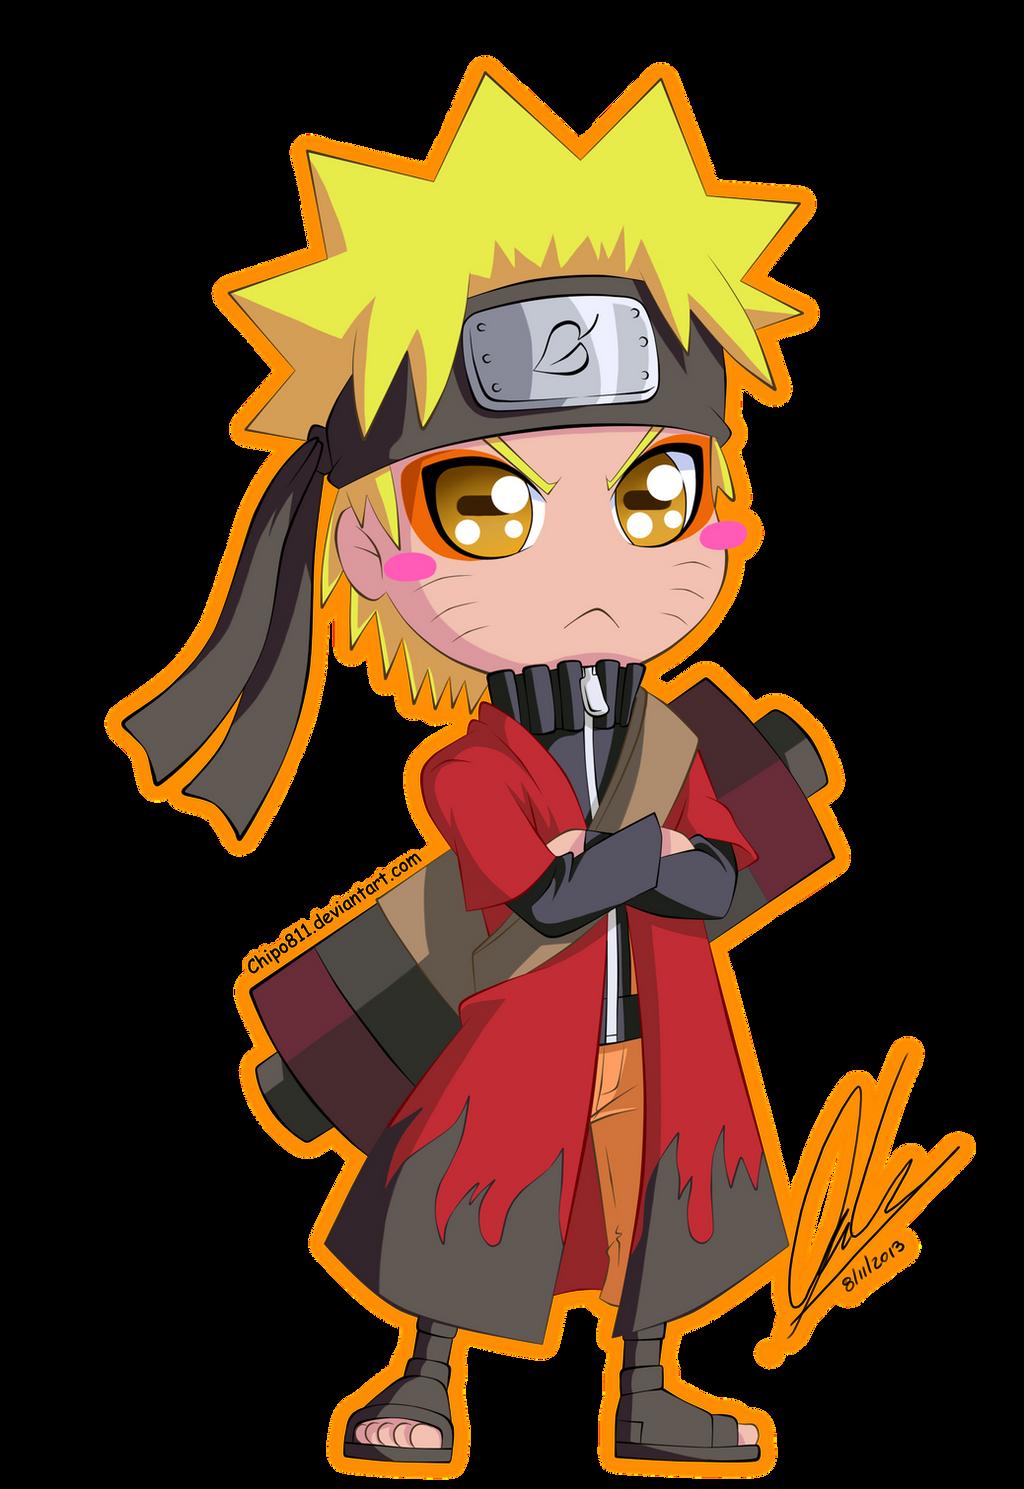 Naruto Chibi Sennin by Chipo811 on DeviantArt